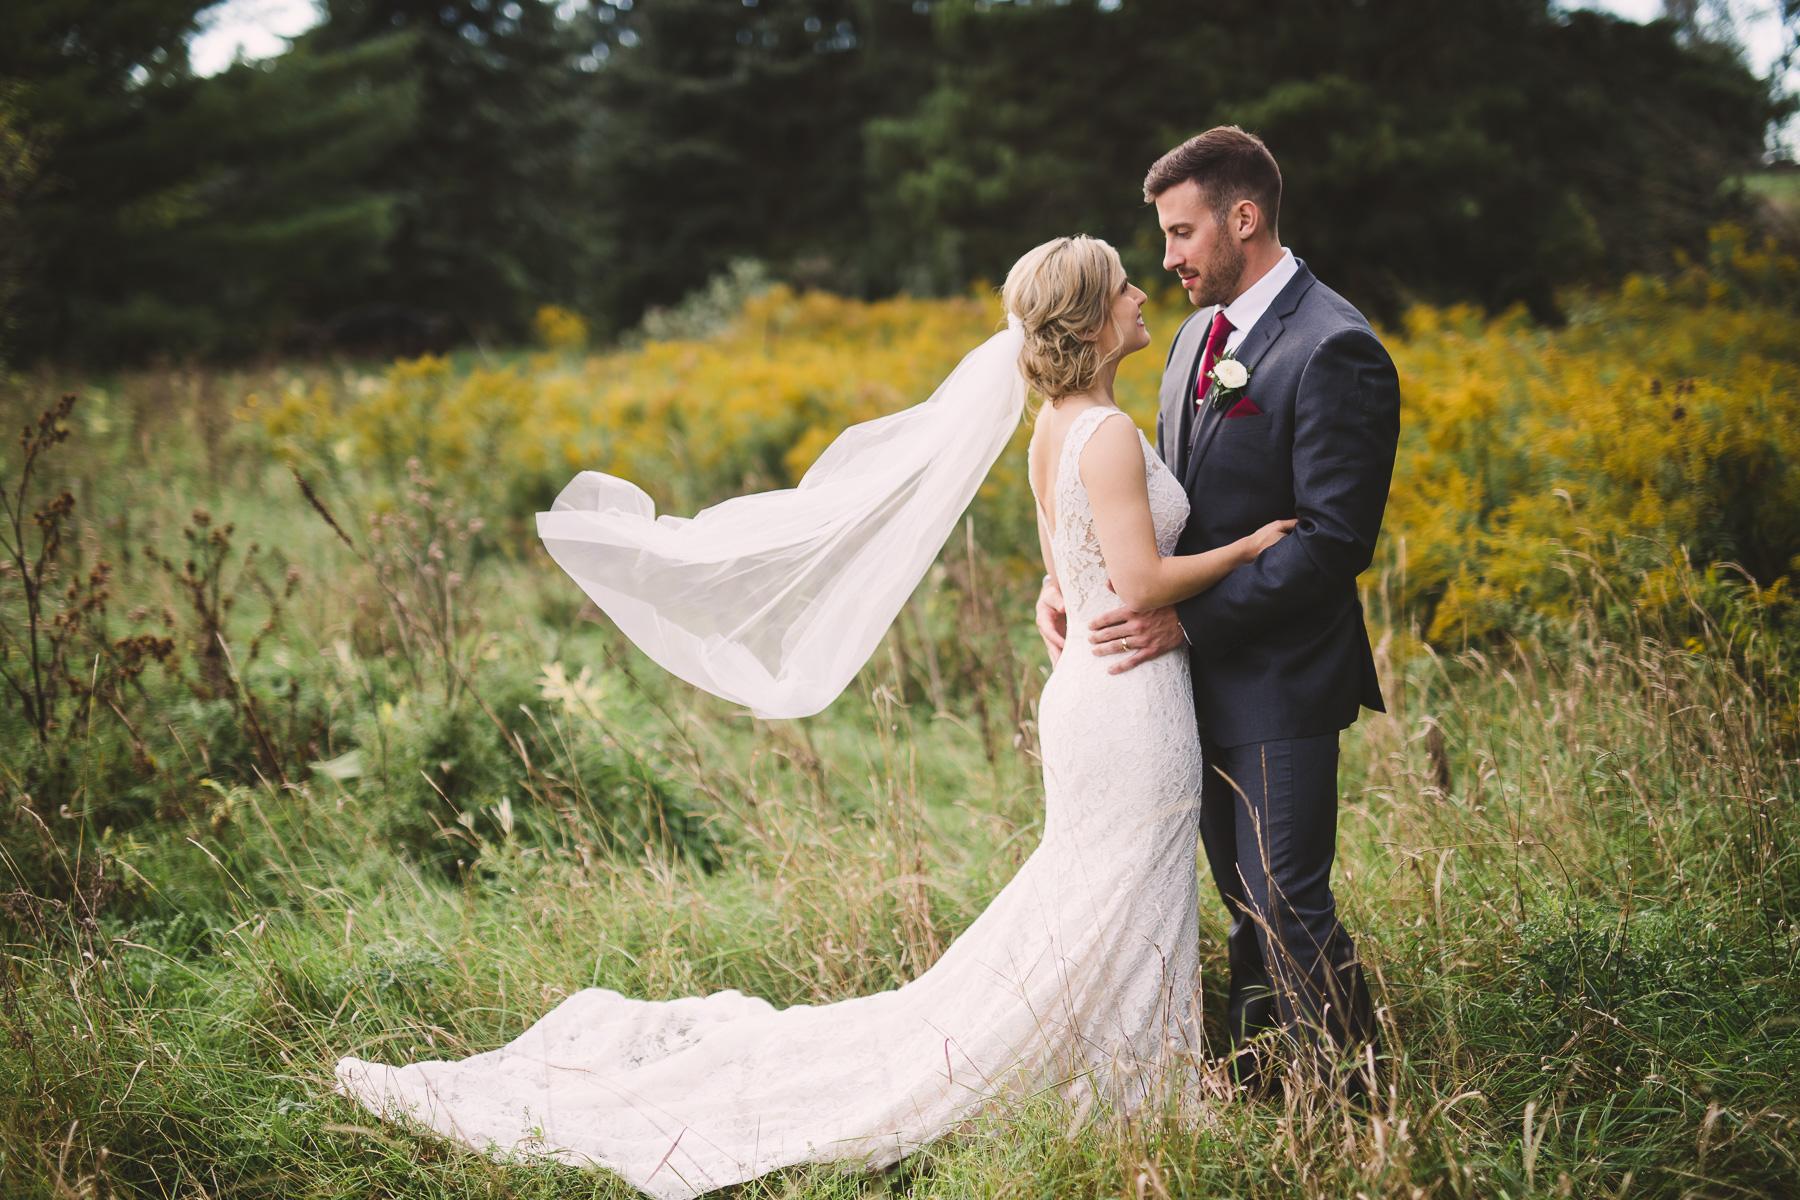 Nadine & Chris Crozier - Married September 22nd, 2018The Hideaway